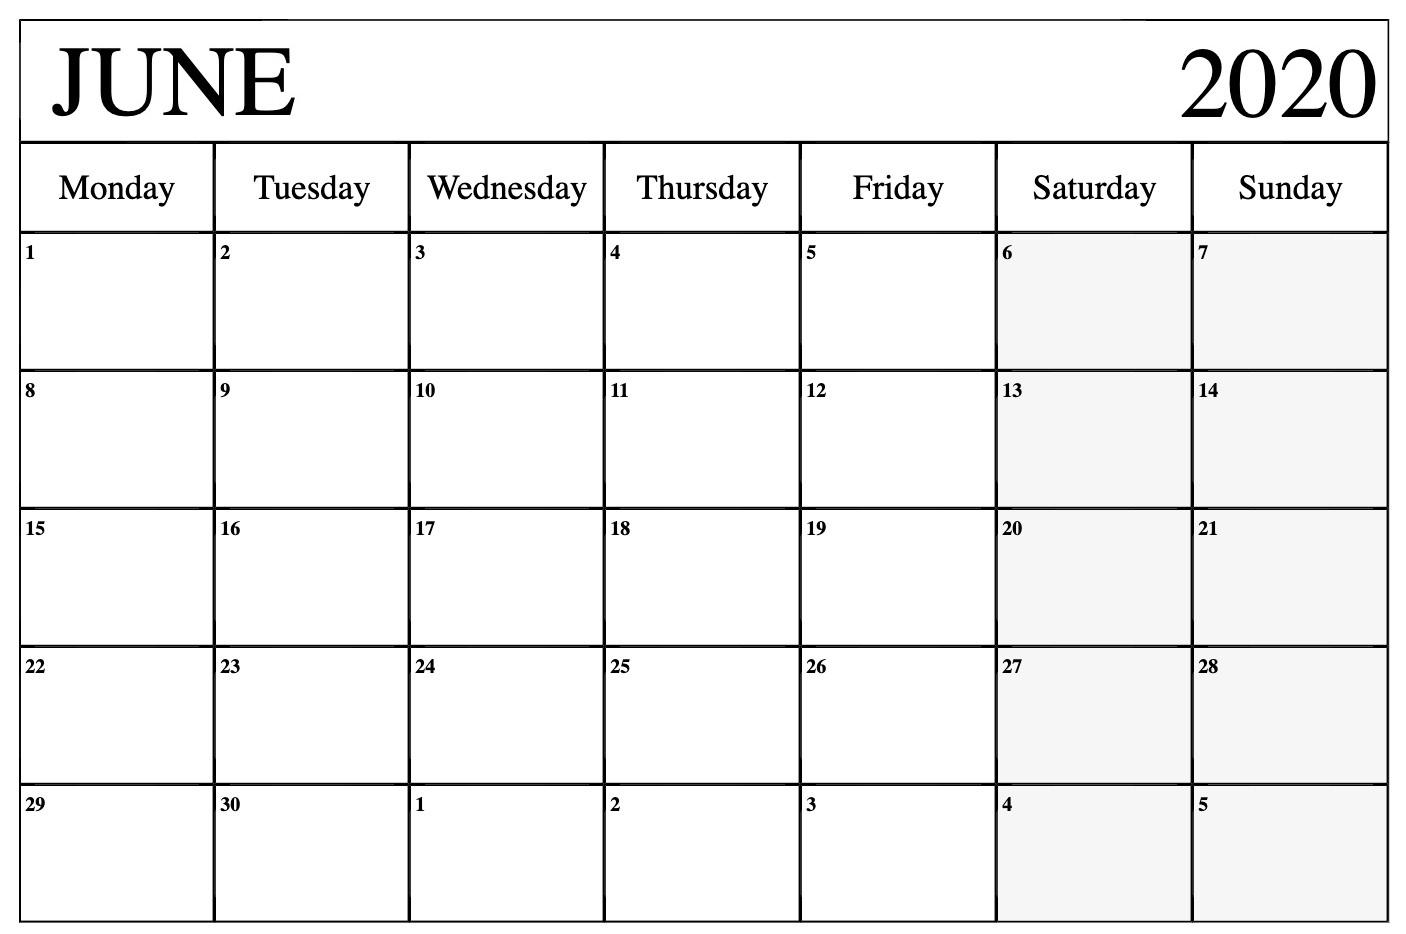 June 2020 Monthly Calendar For Kids